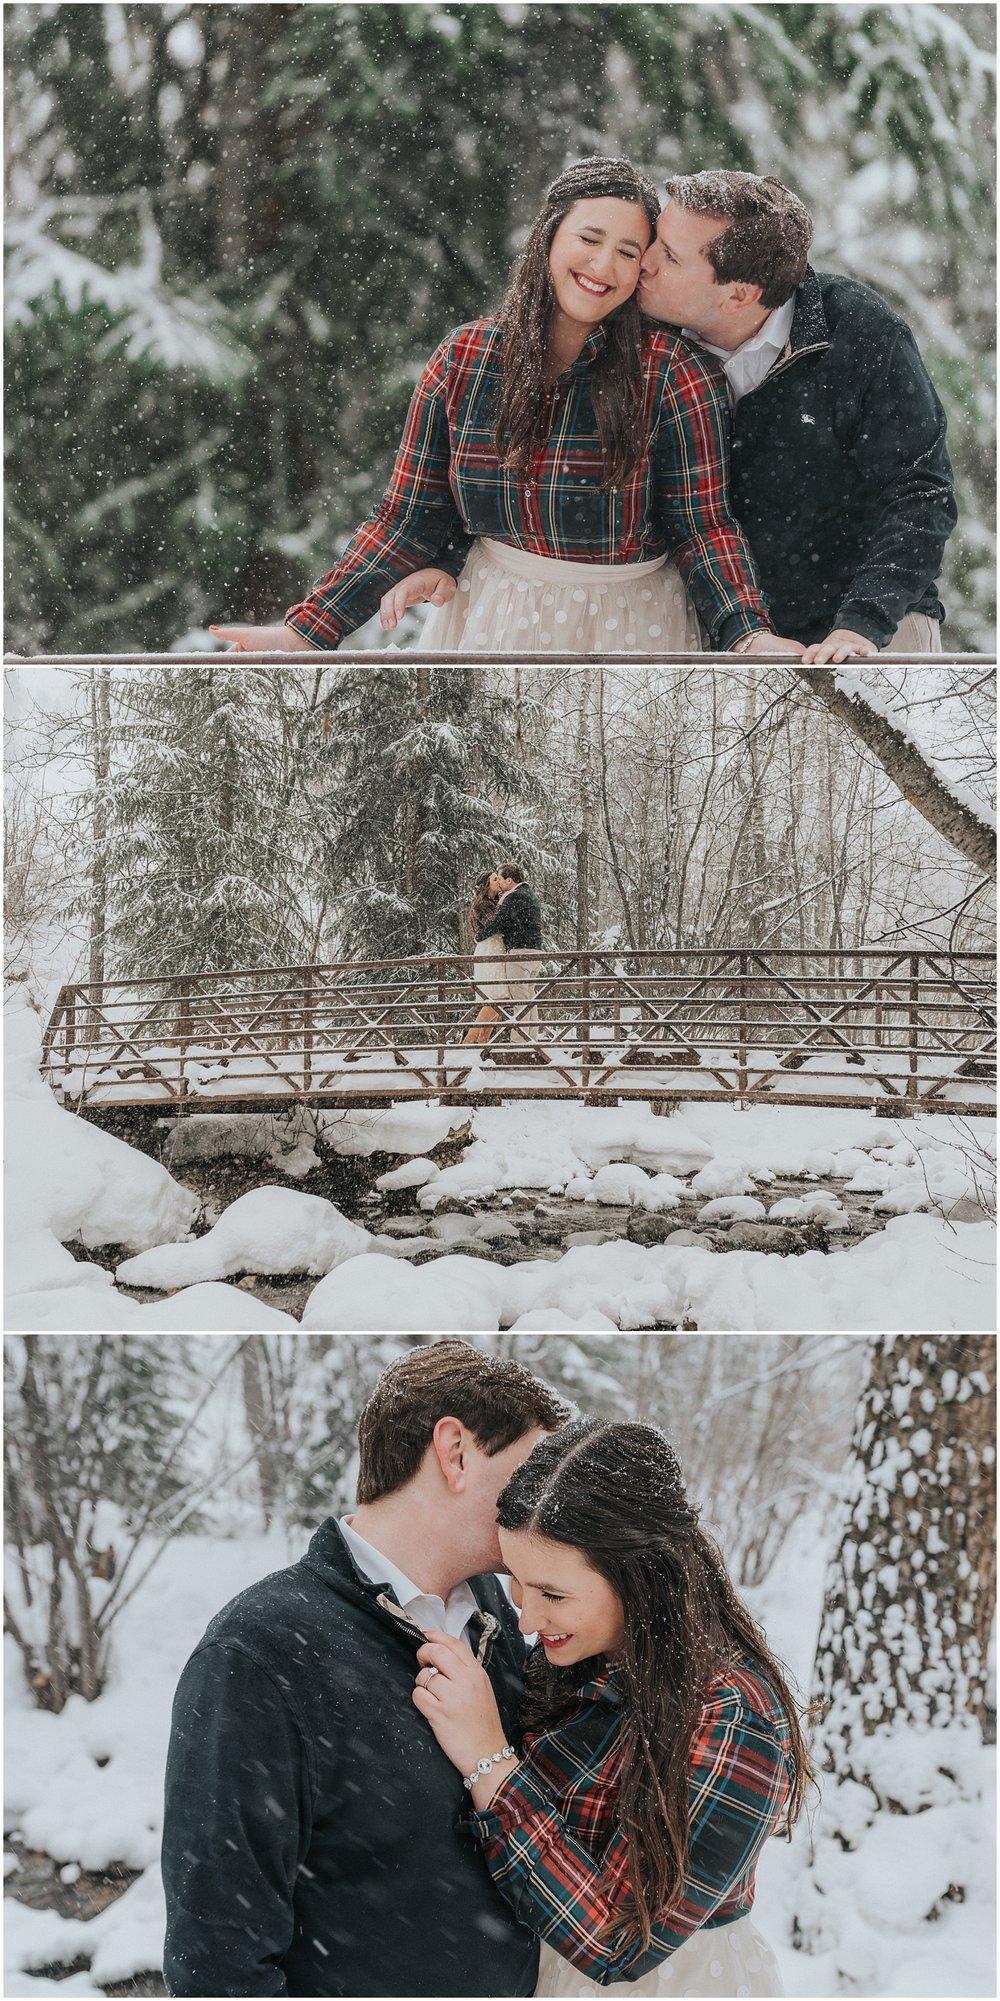 beavercreek_colorado_winter_engagement_photos_0004.jpg